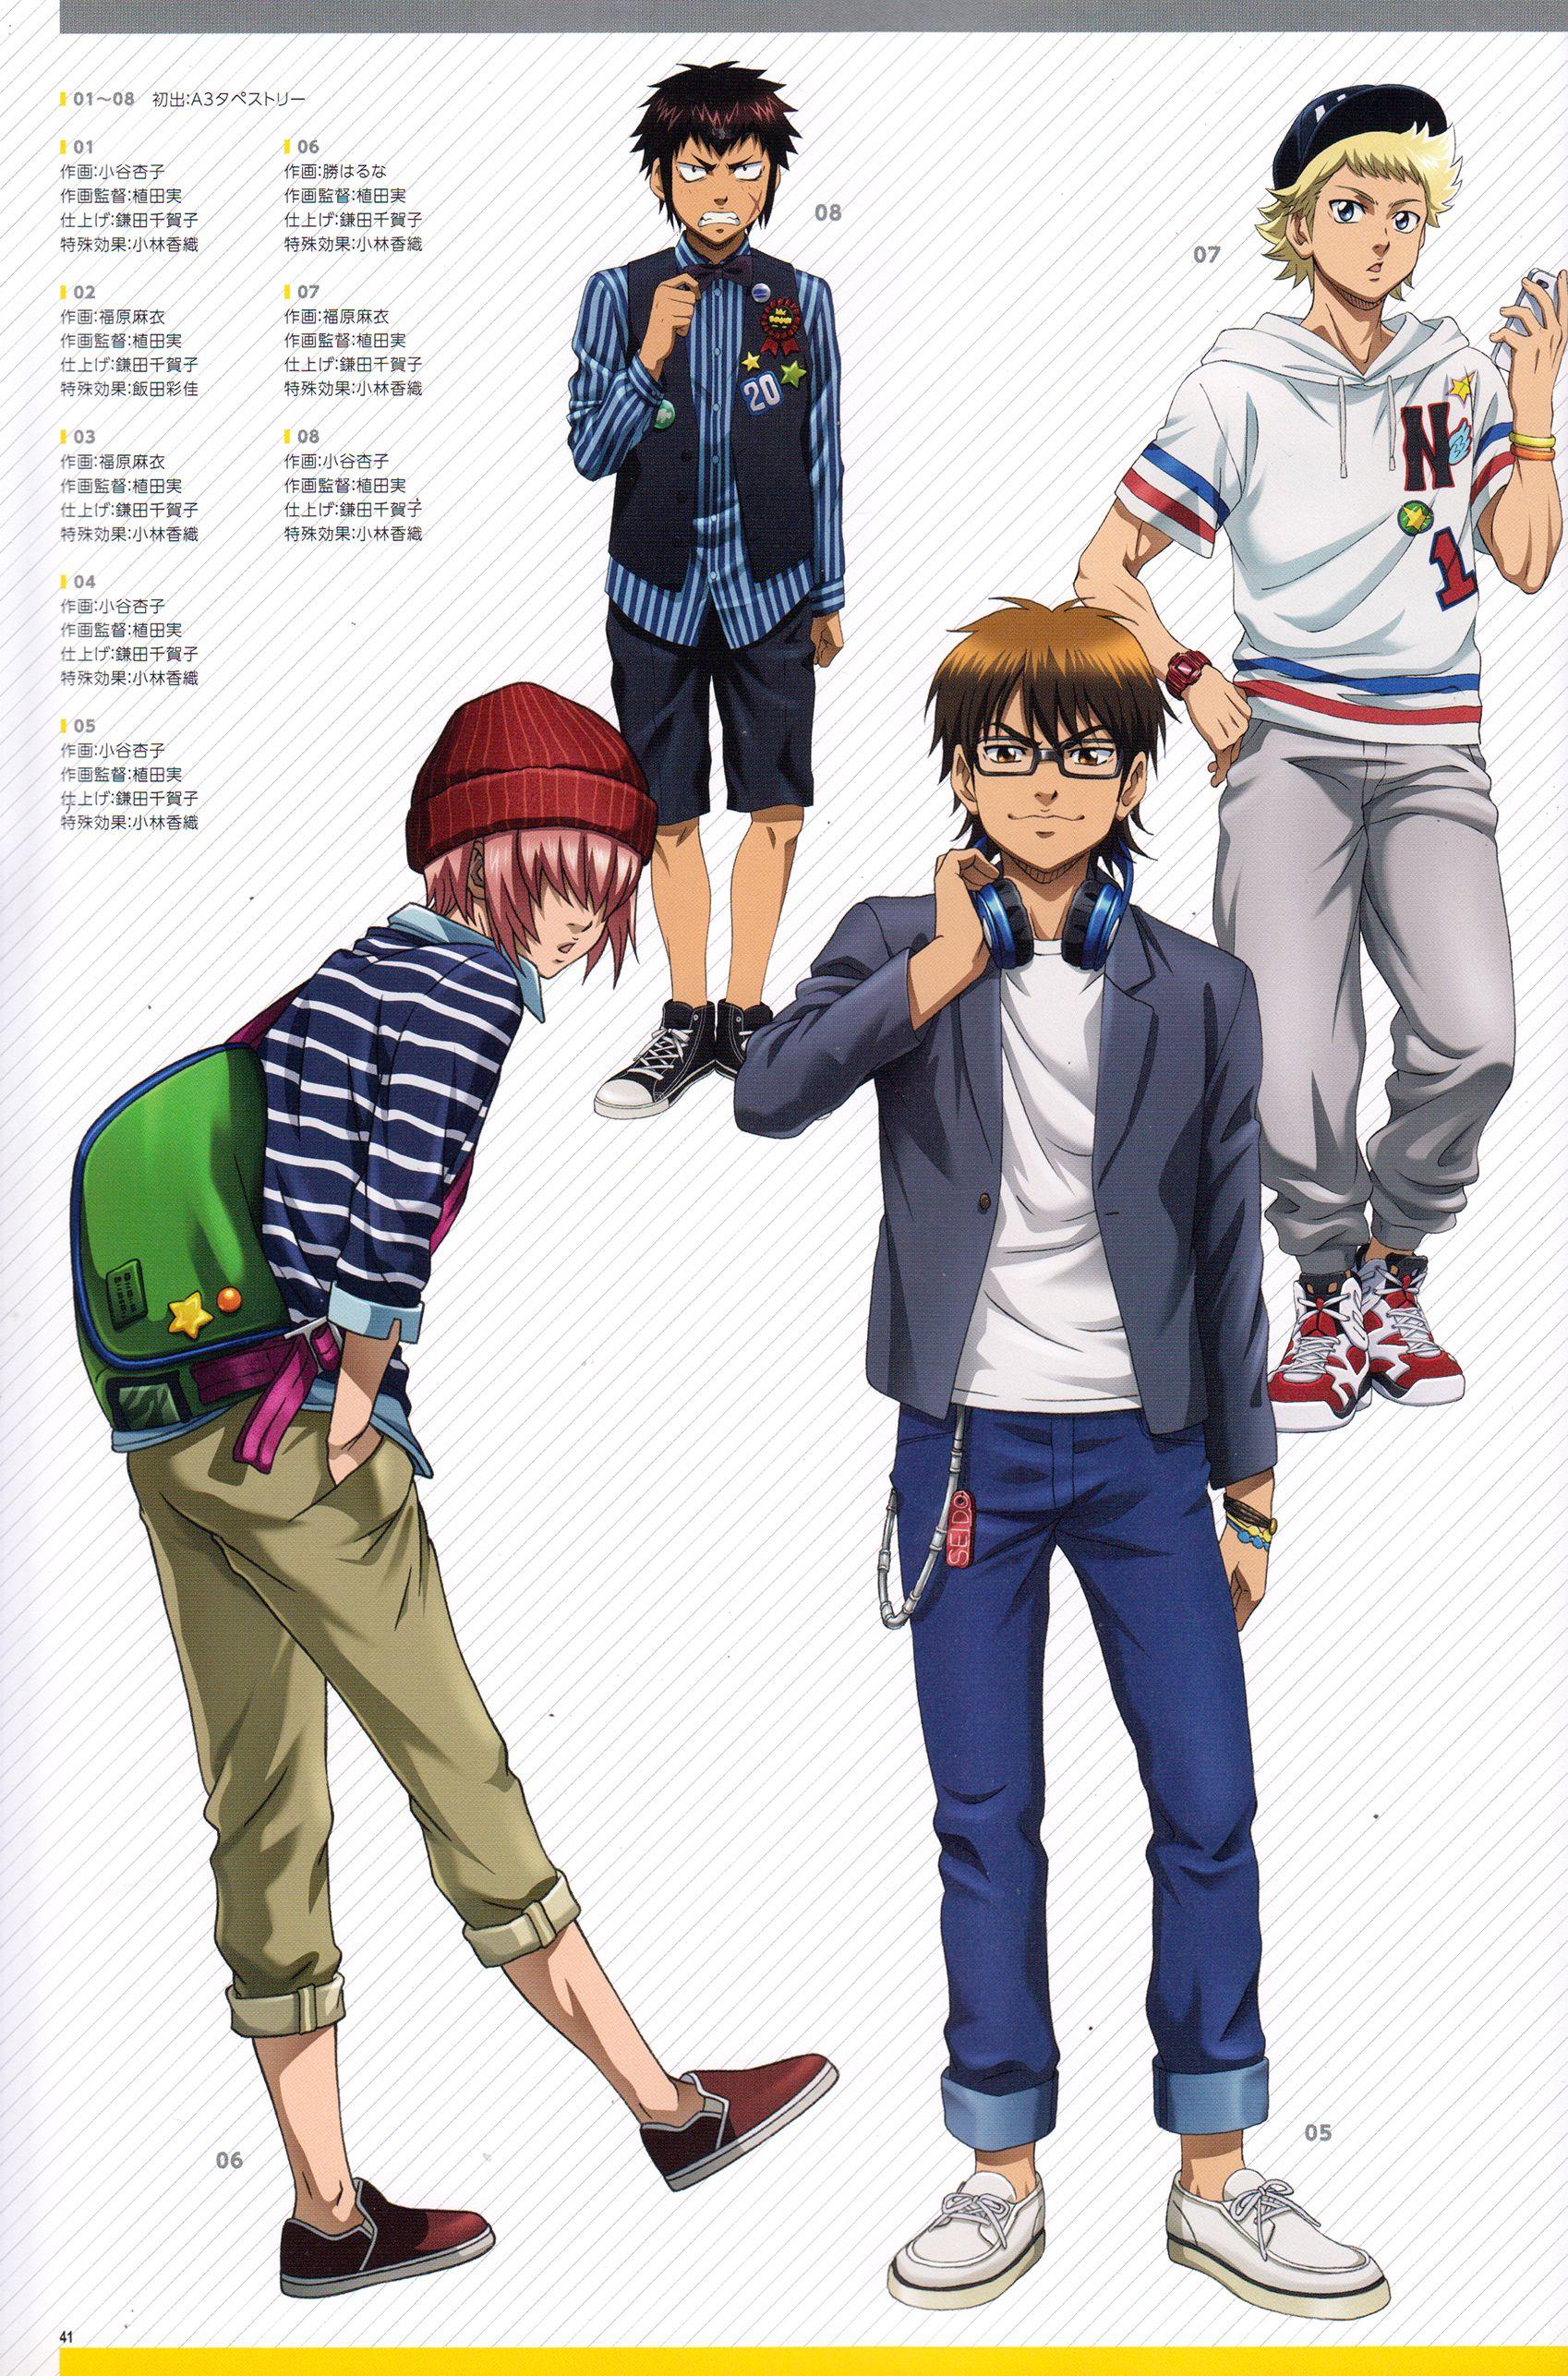 Ace of Diamond Raichi, Mei, Haruichi, and Miyuki 御幸一也